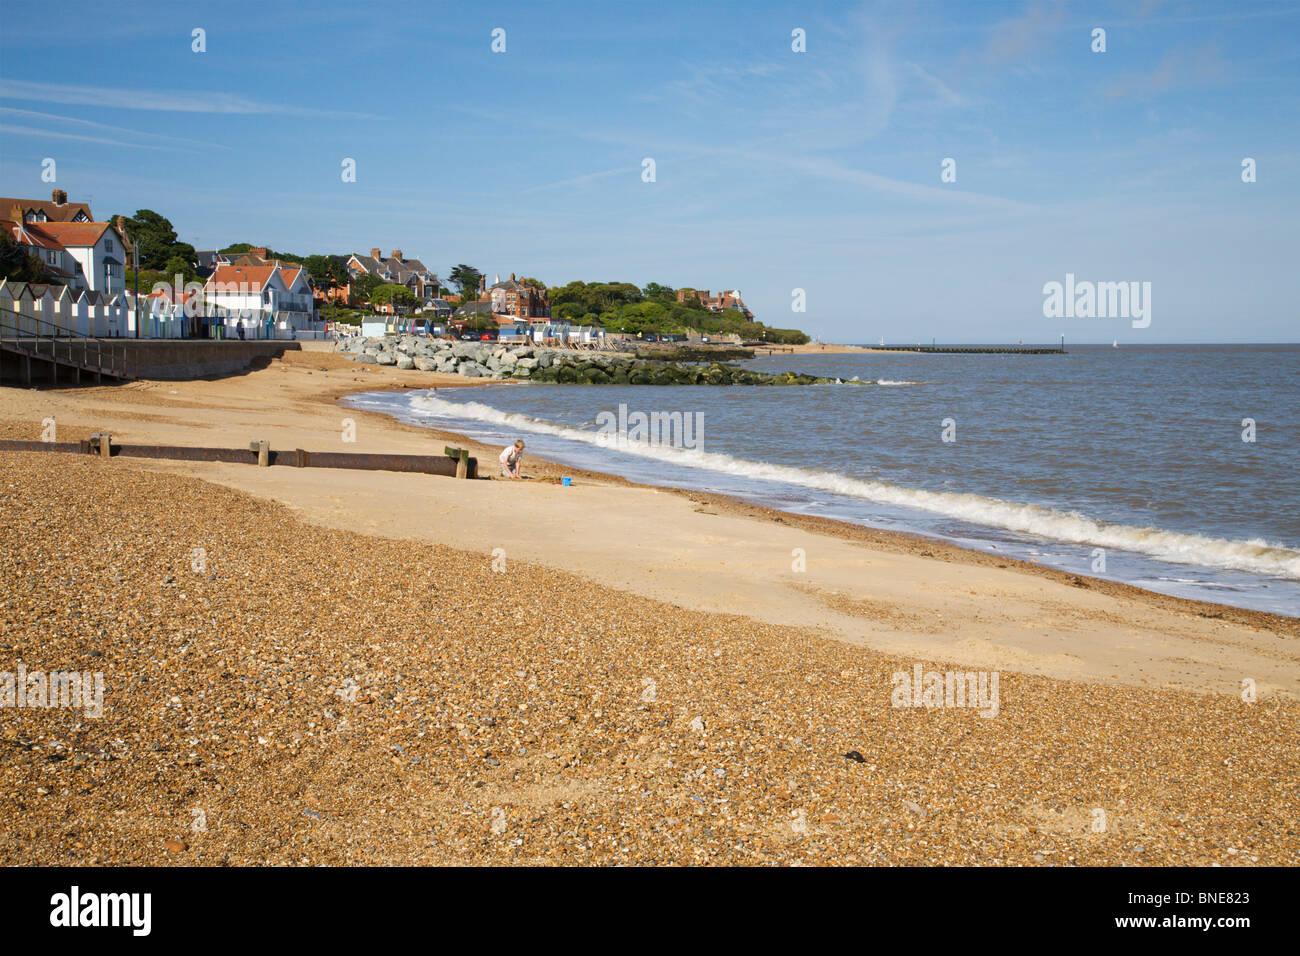 Felixstowe golden sandy beach, Suffolk, England, UK. - Stock Image